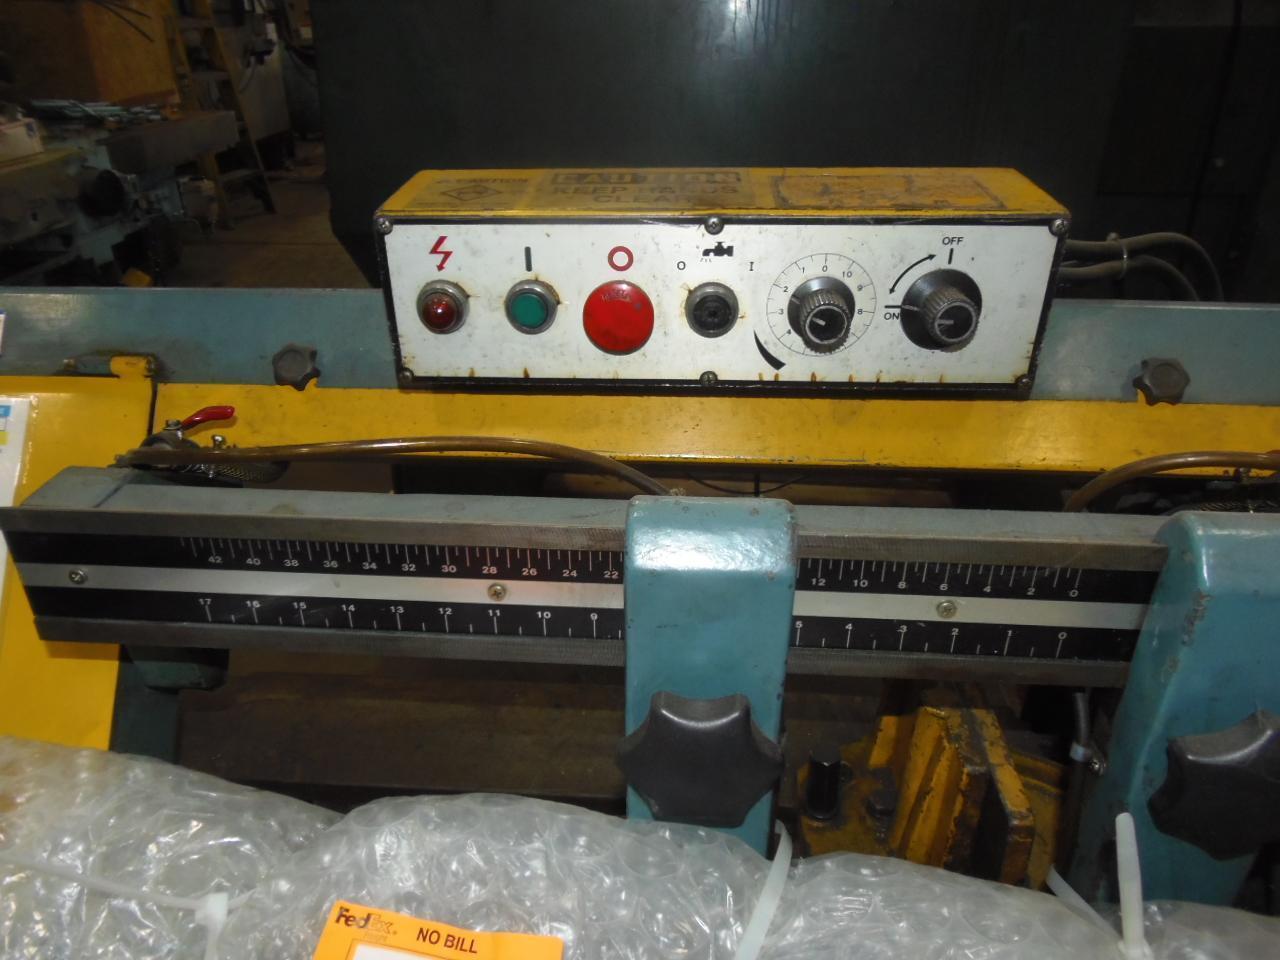 "10"" TURN-PRO MANUAL BAND SAW, MODEL BS-250"